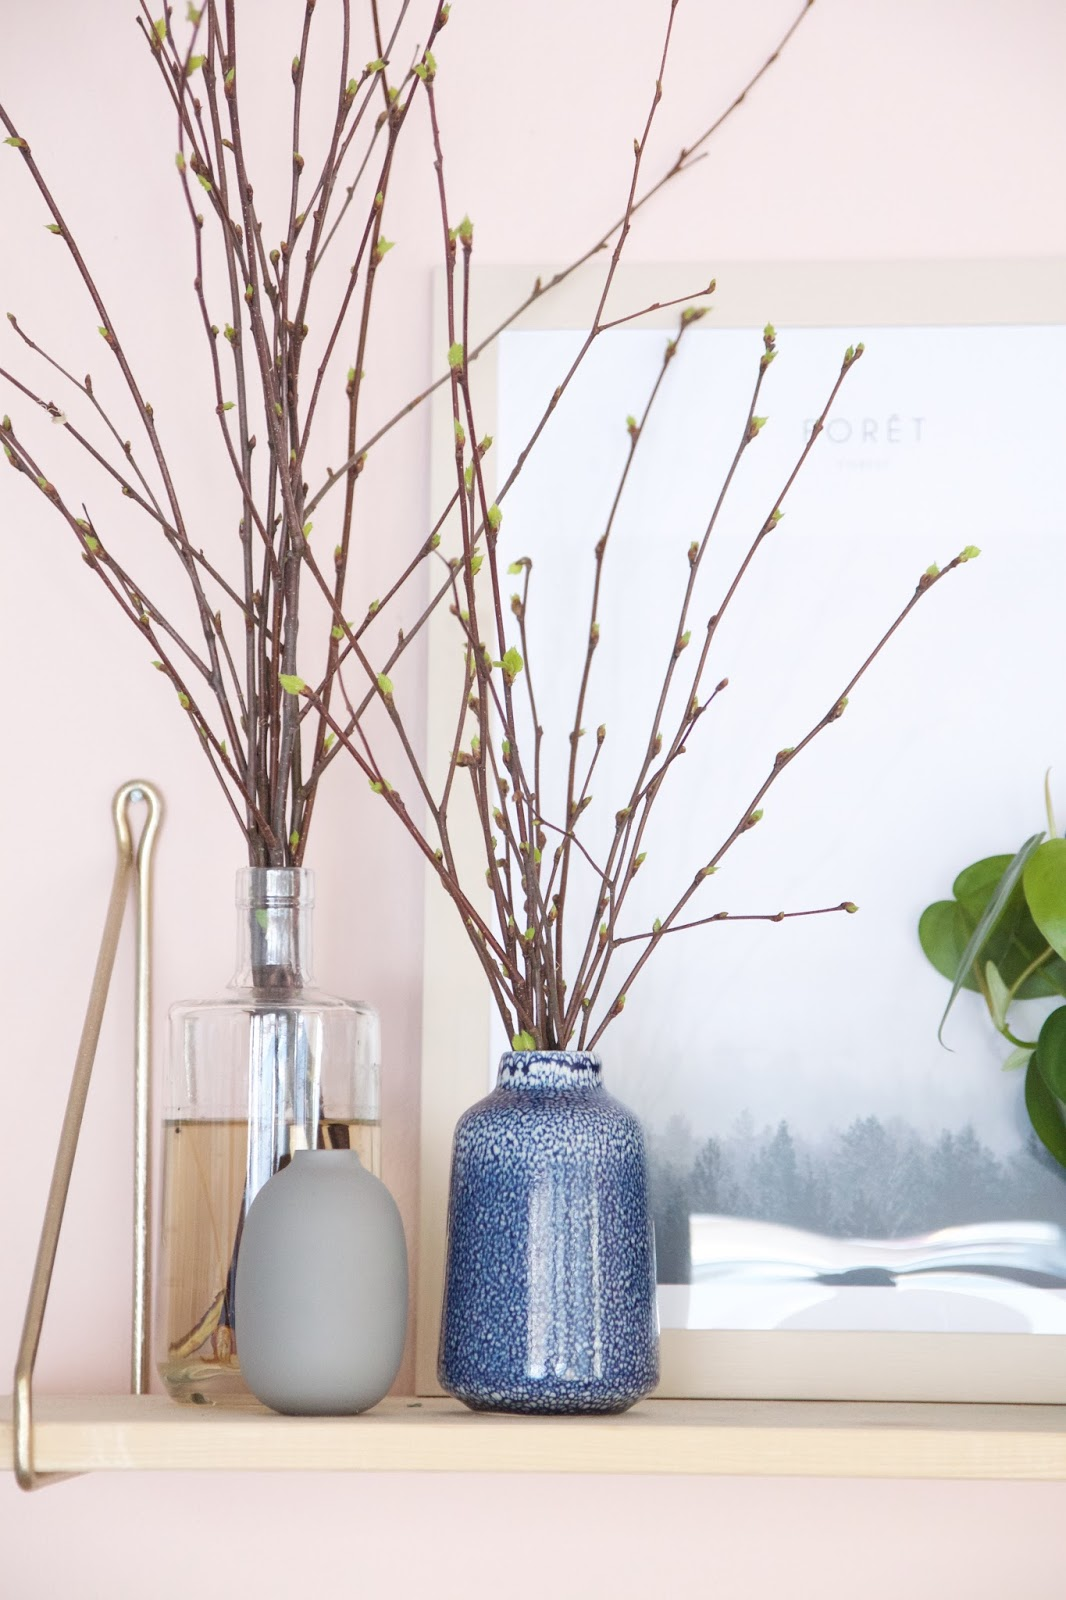 online dating site kirsikka kukka Kuka vuodelta DWTS 2015